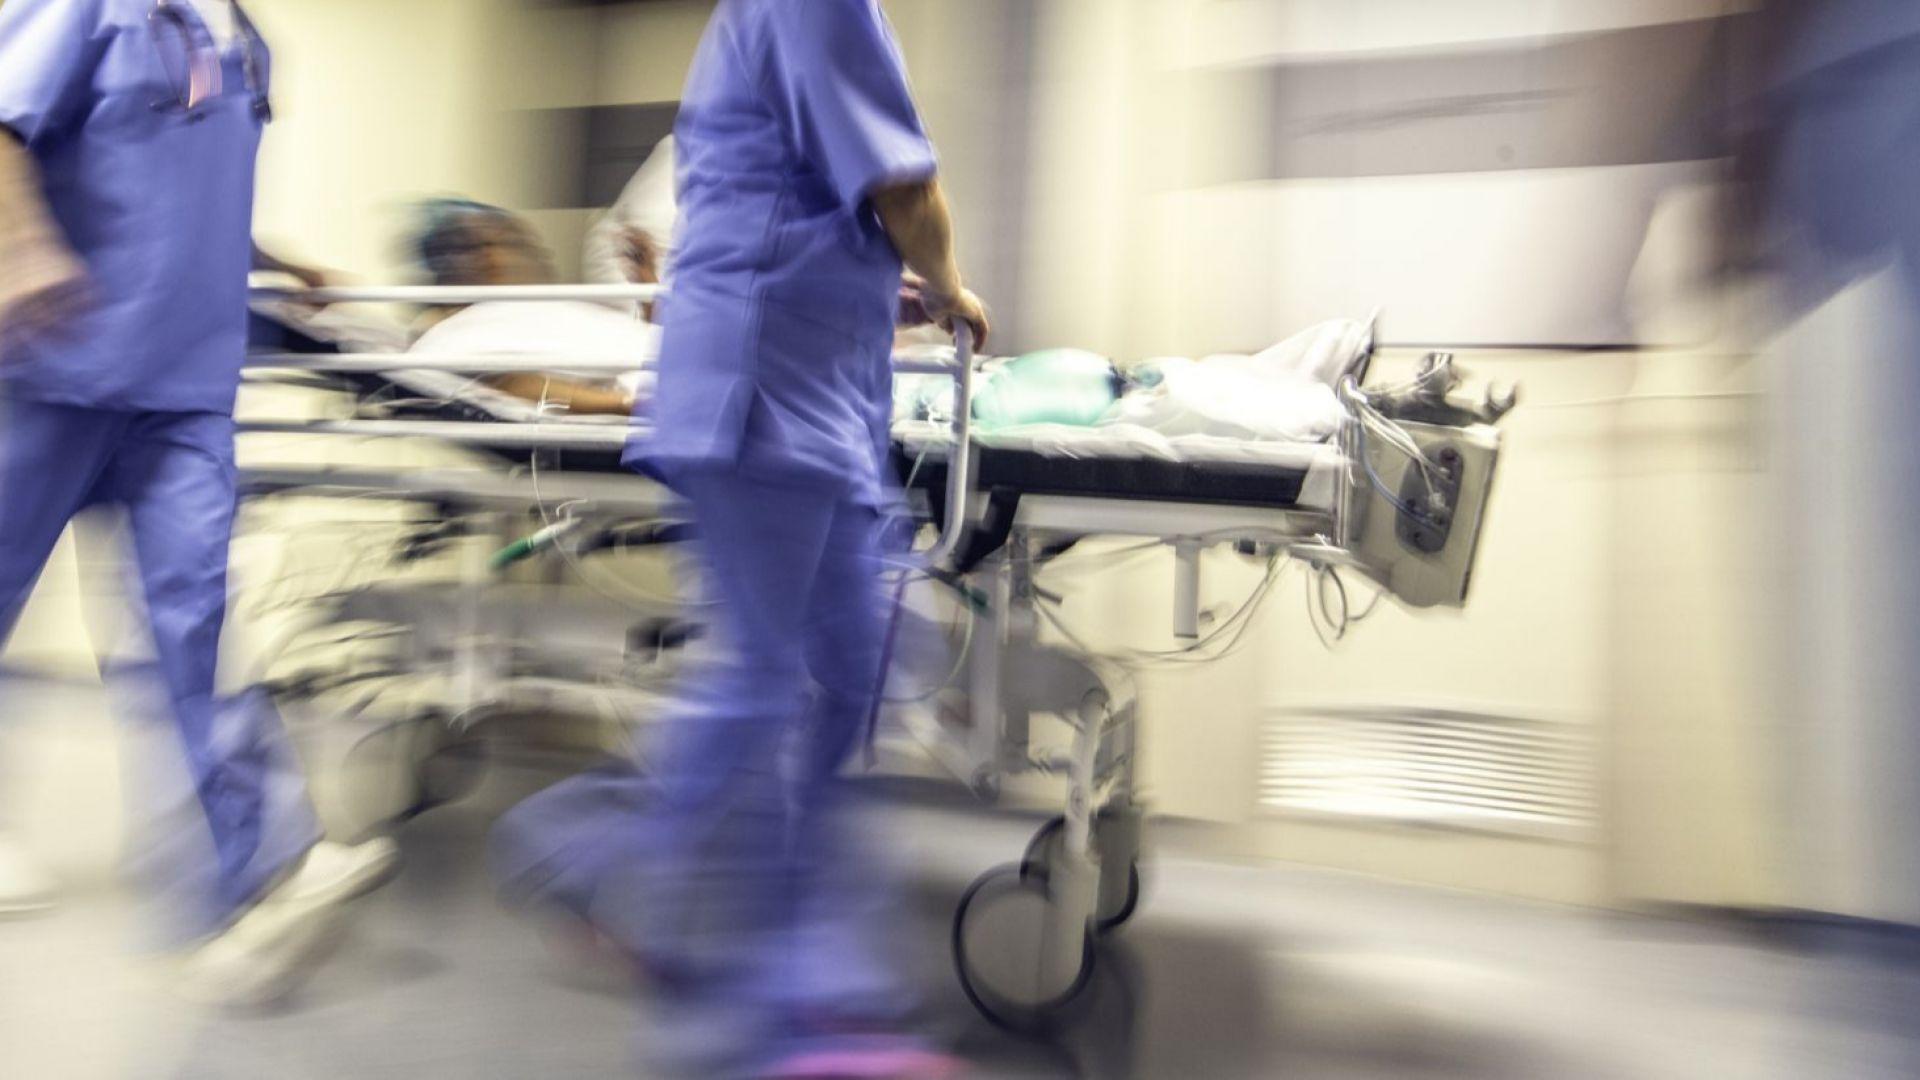 КНСБ: Над 55 процента от здравните работници се трудят под стрес